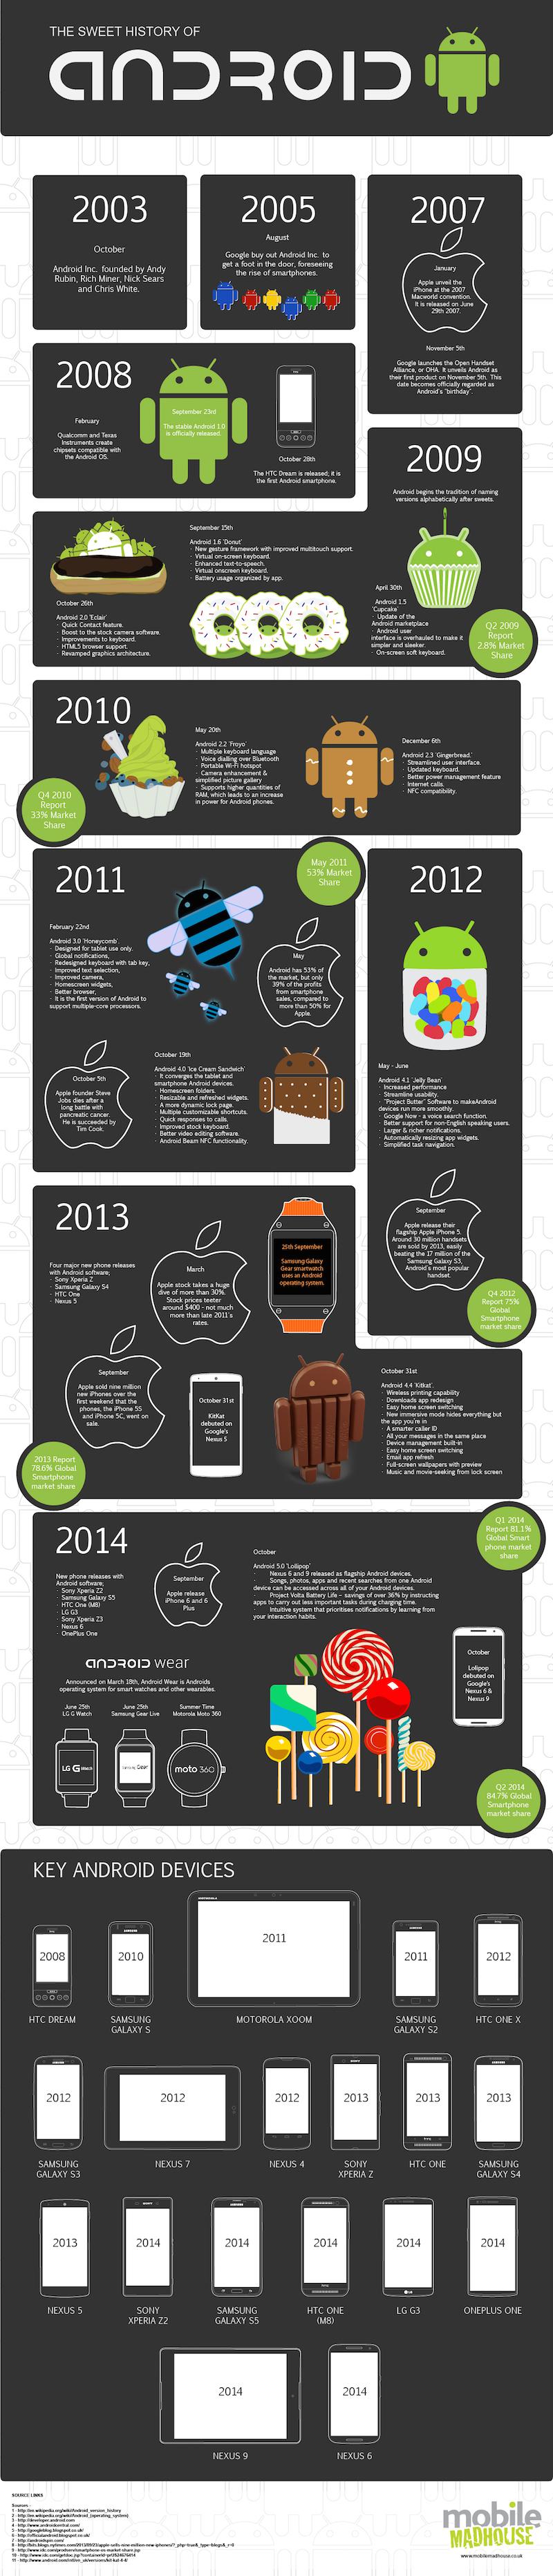 Infografika: Słodka historia Androida od 2003 roku do 2014 roku